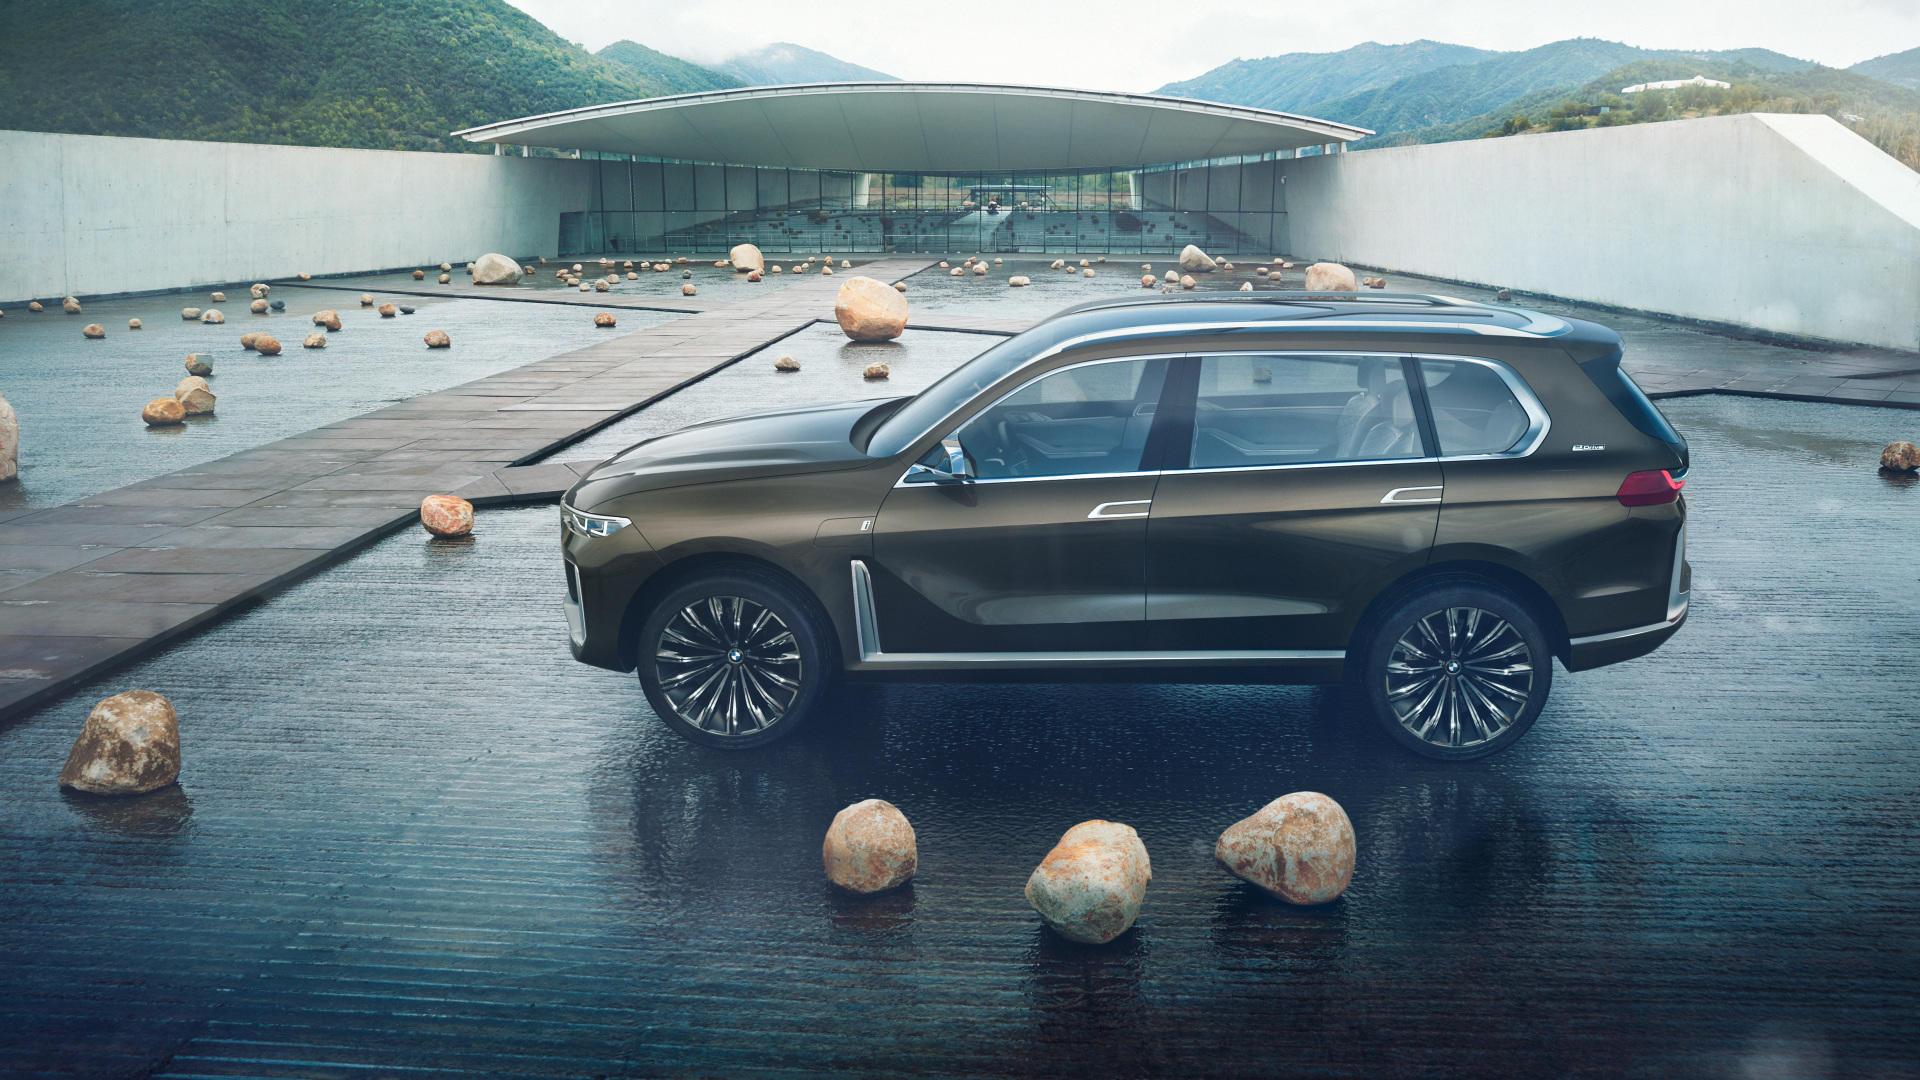 BMW-x7-concept-dm-4.jpg